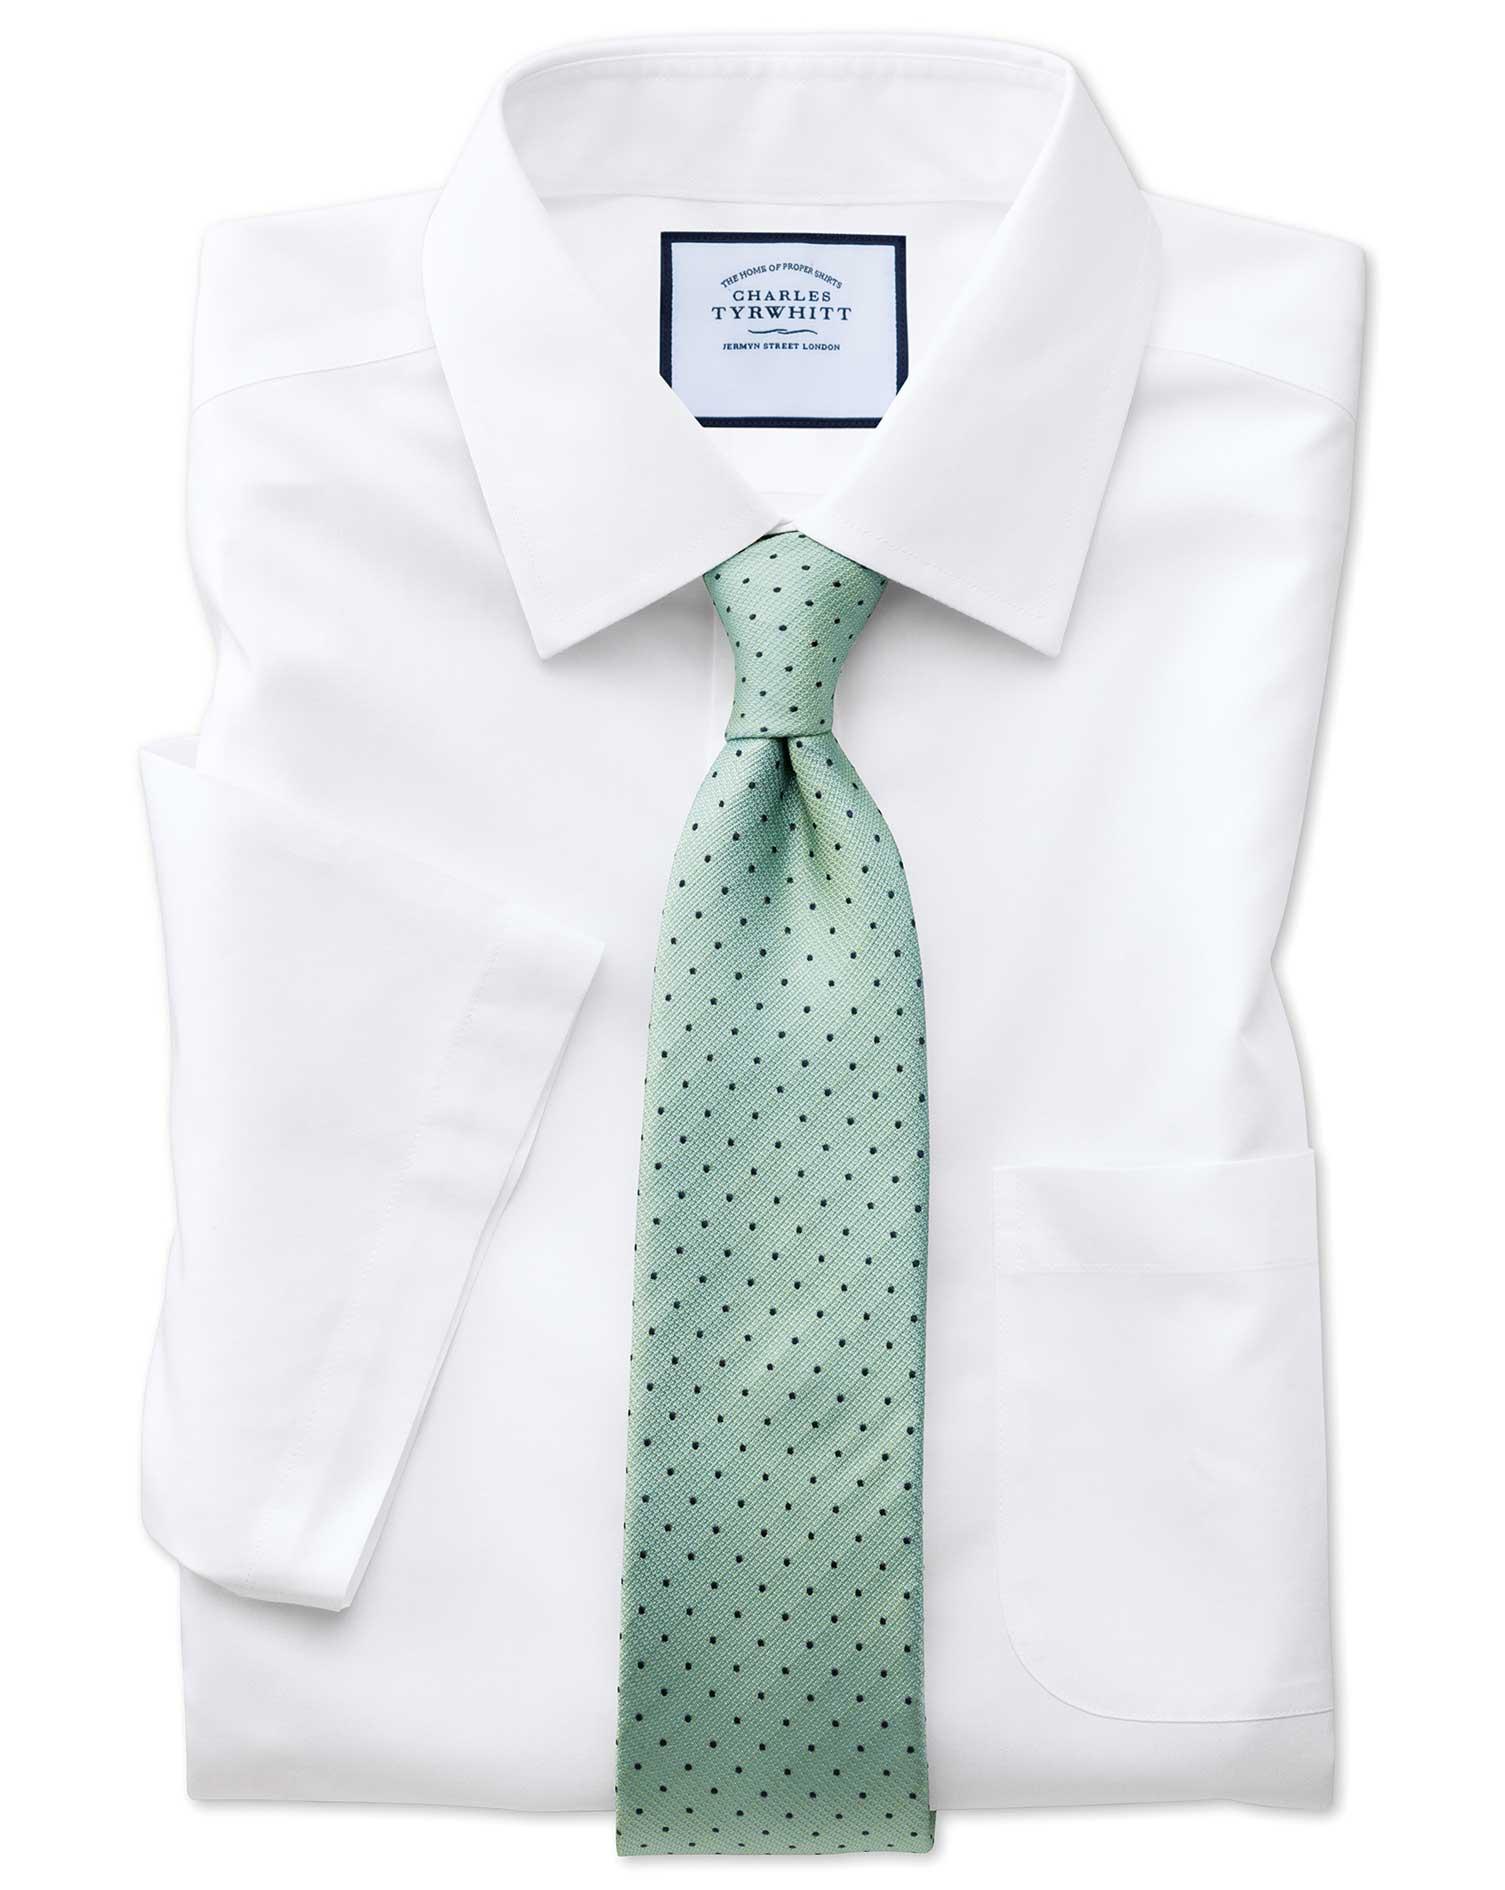 Slim fit non iron short sleeve white shirt charles tyrwhitt for Slim fit non iron shirts